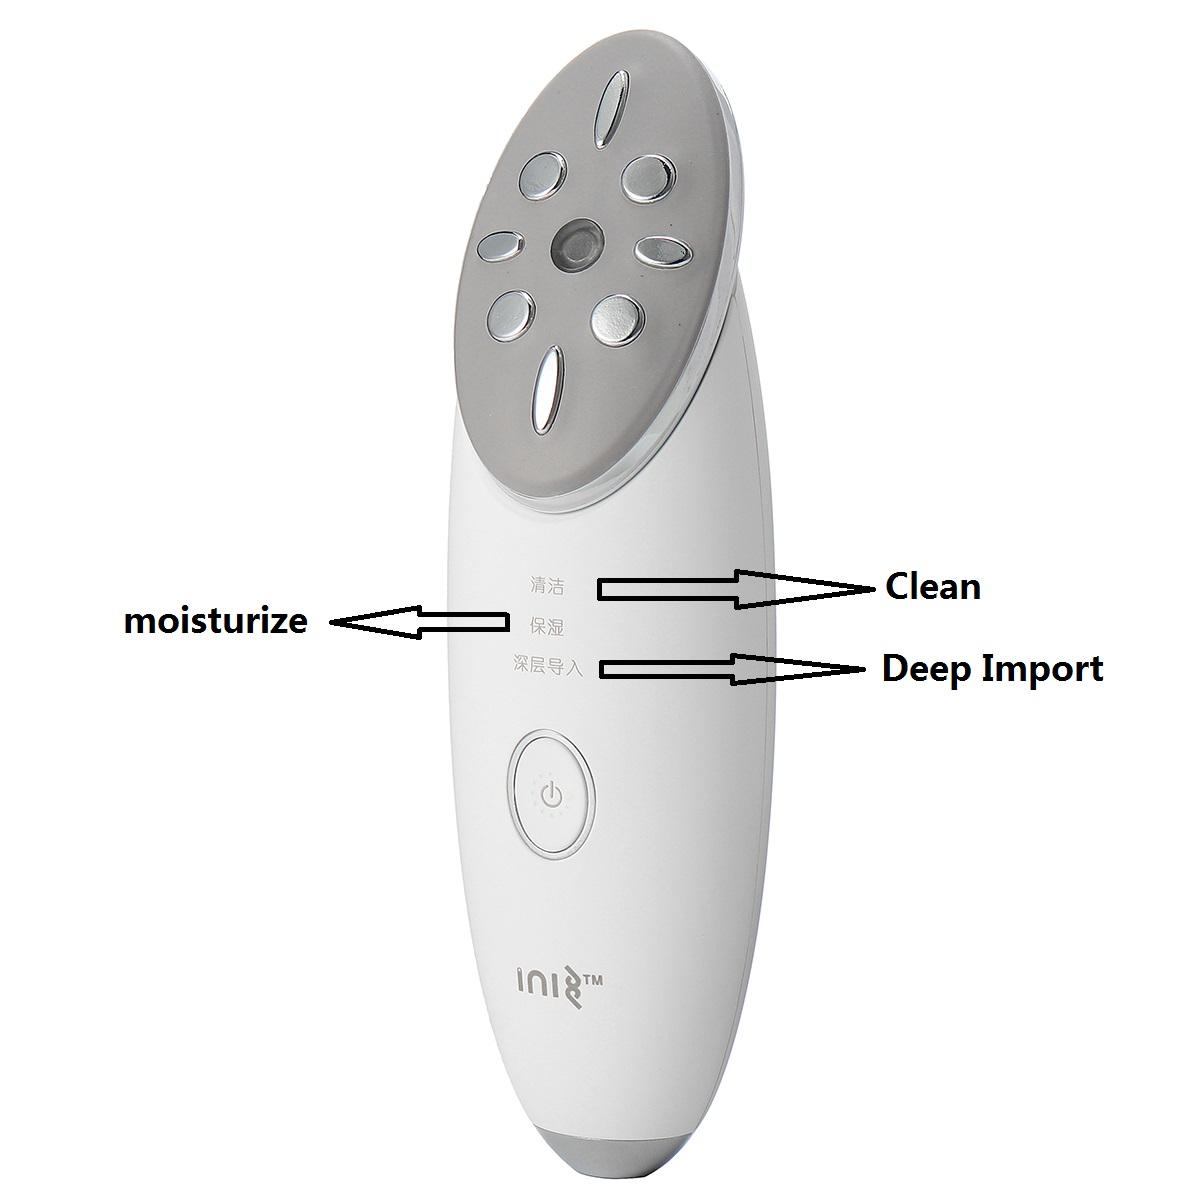 USB Multifunction Electric Skin Rejuvenation Instrument